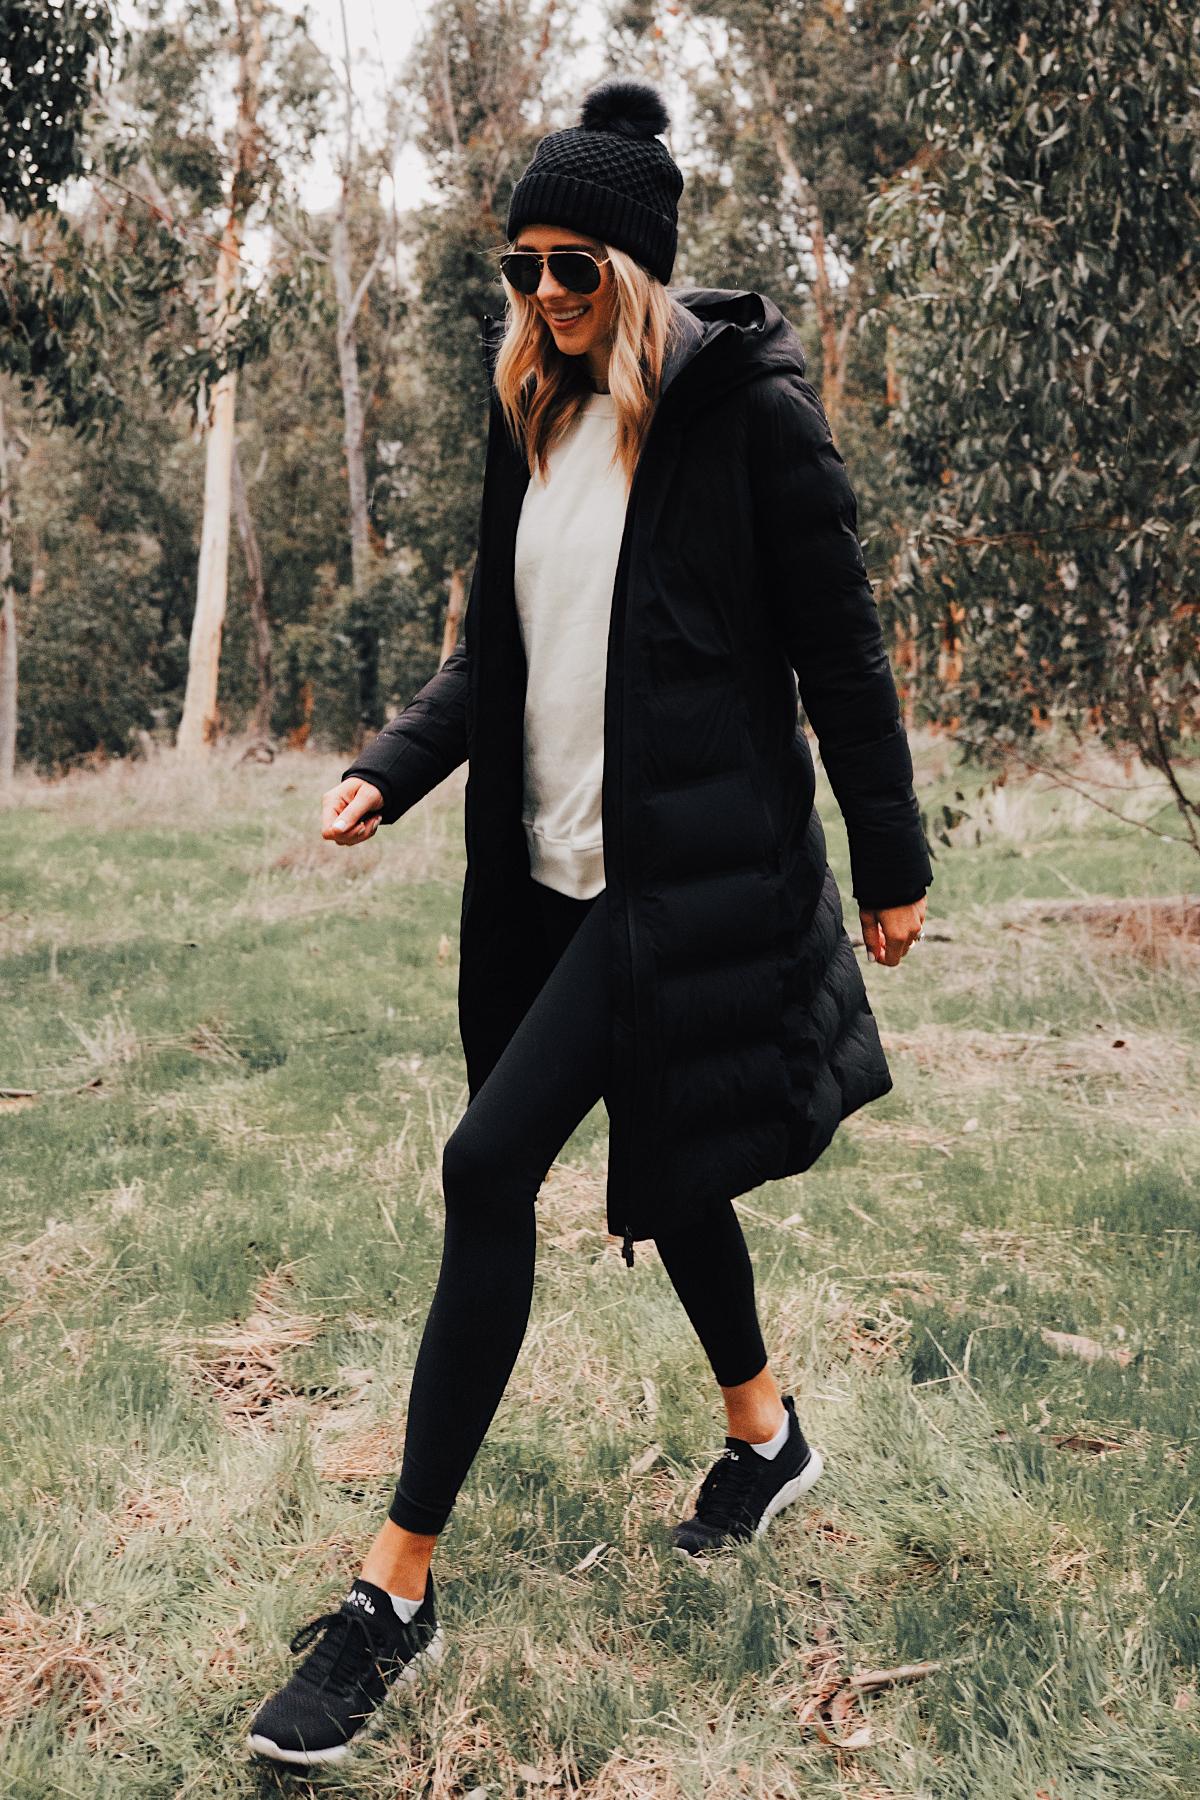 Fashion Jackson Wearing lululemon Black Sleet Street Long Jacket Black Beanie Black Leggings hikes in San Diego 1